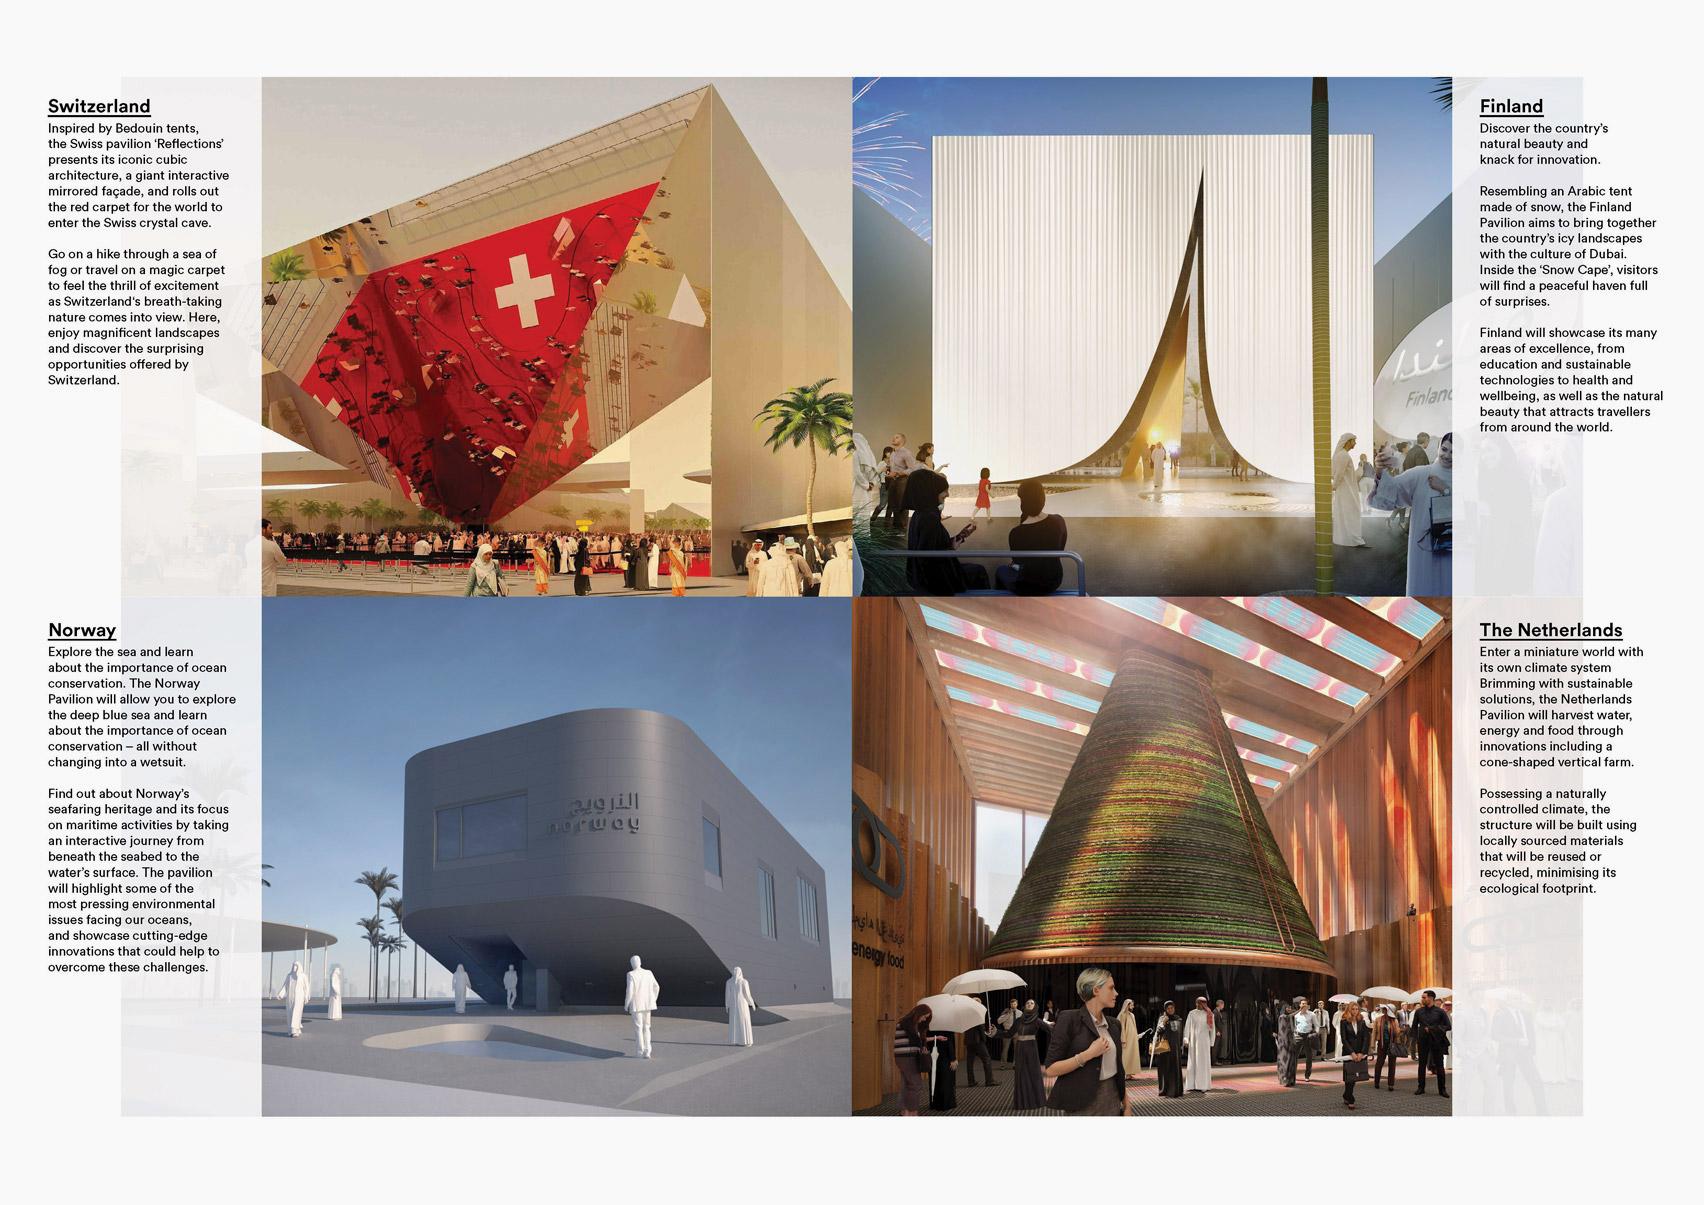 Four Expo 2020 Dubai pavilions